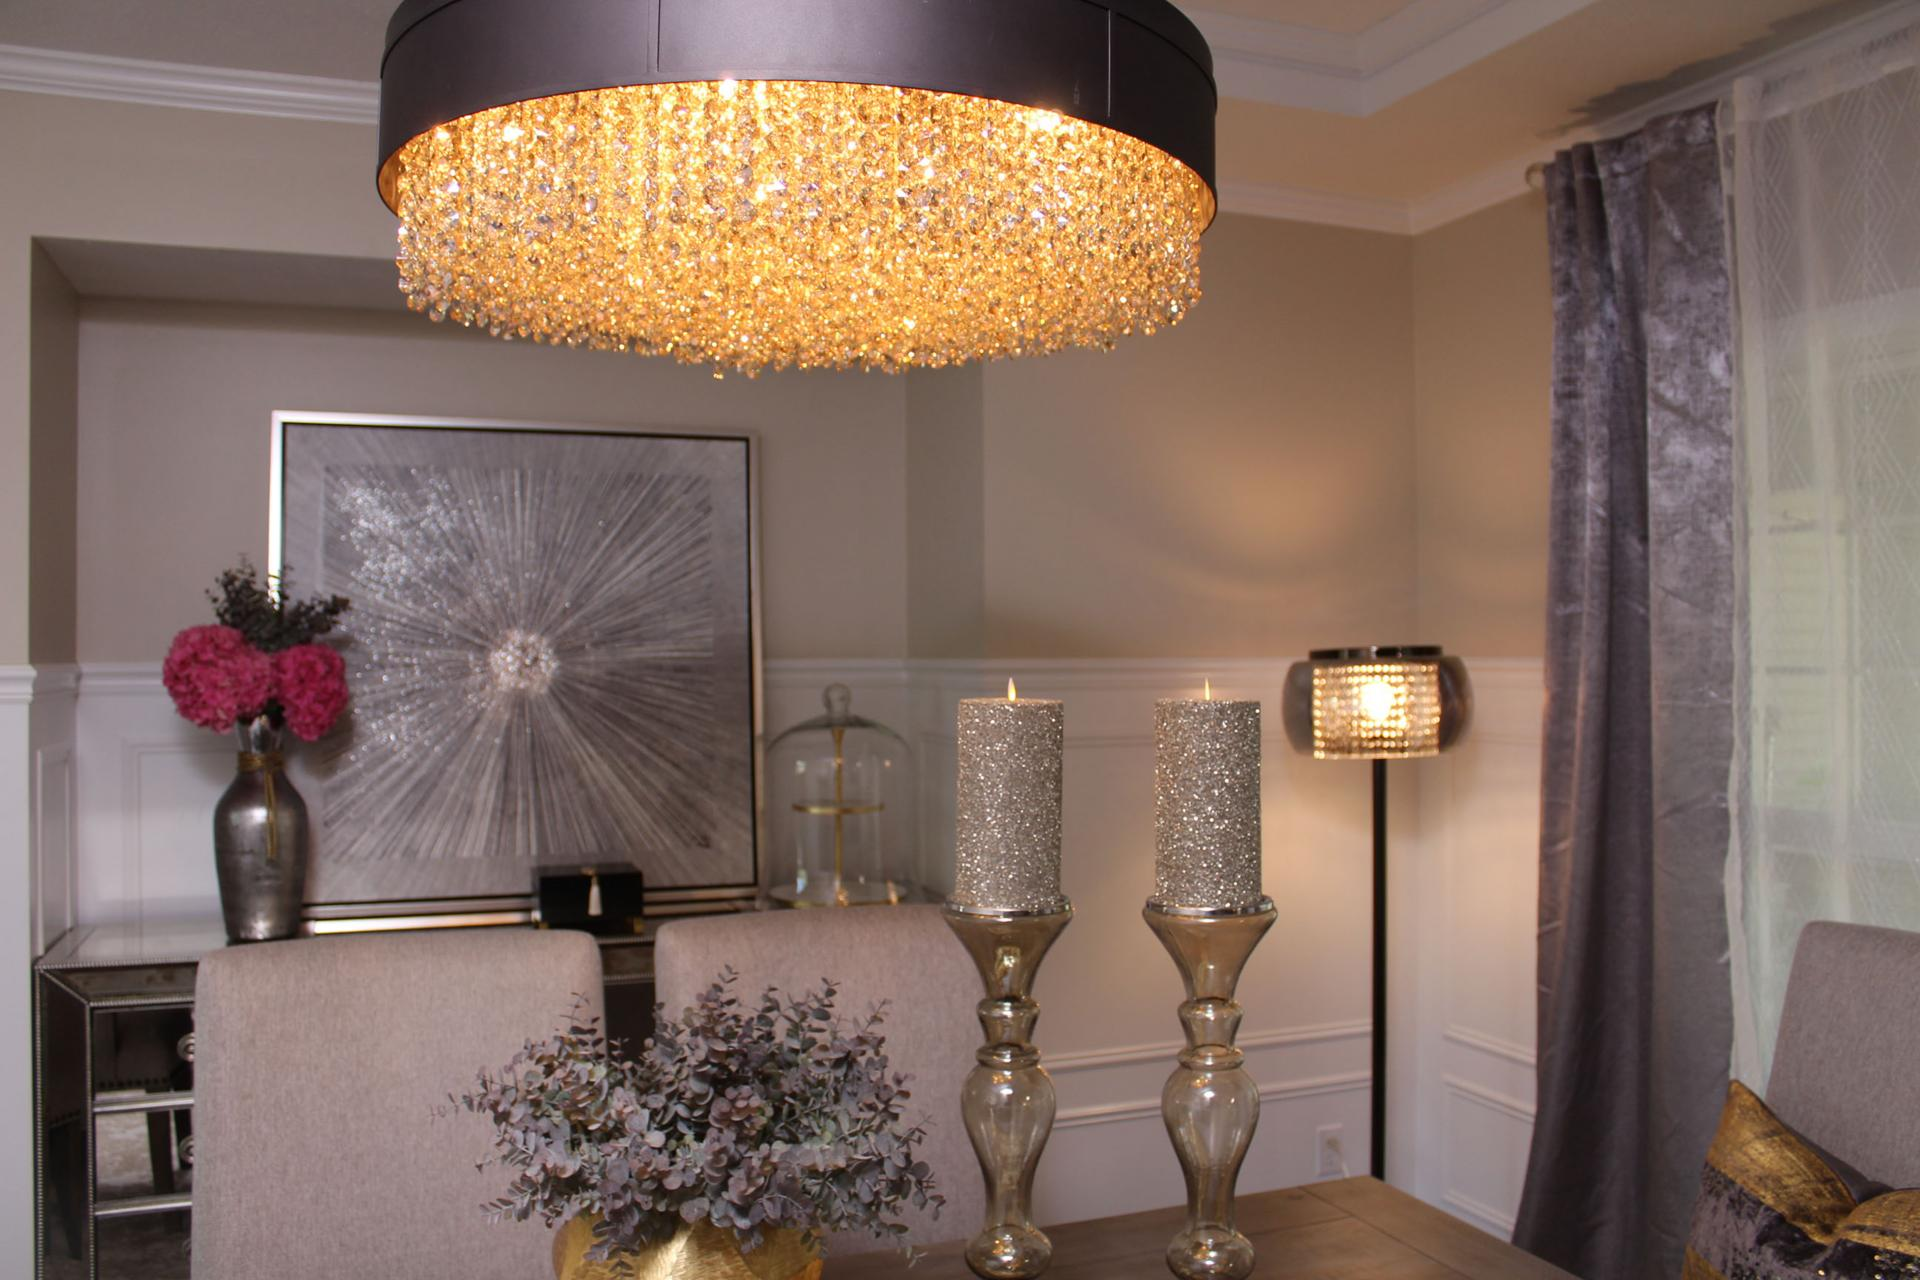 farahjmerhi style insider inspiration room makeover image 07